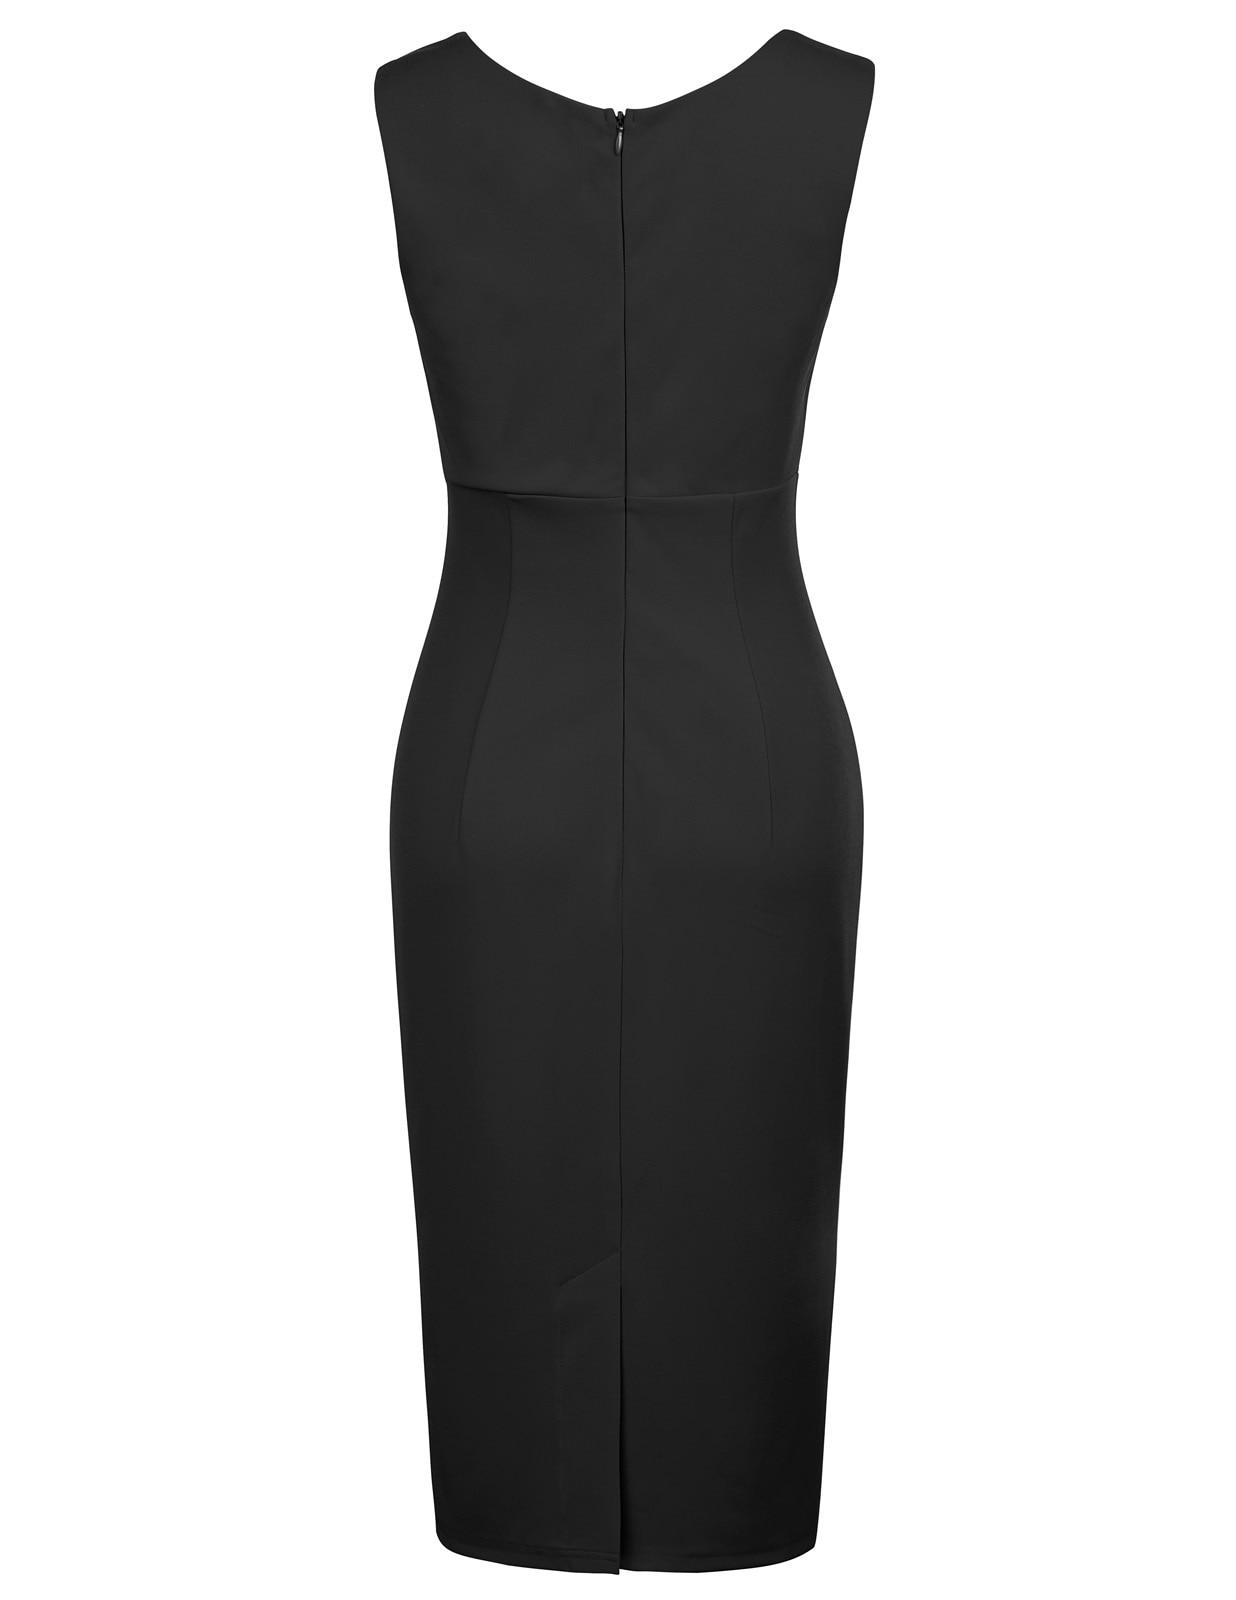 New Dress for Junior Pencil Retro Womens Slim Fit Plain V-neck Sleeveless 1950s